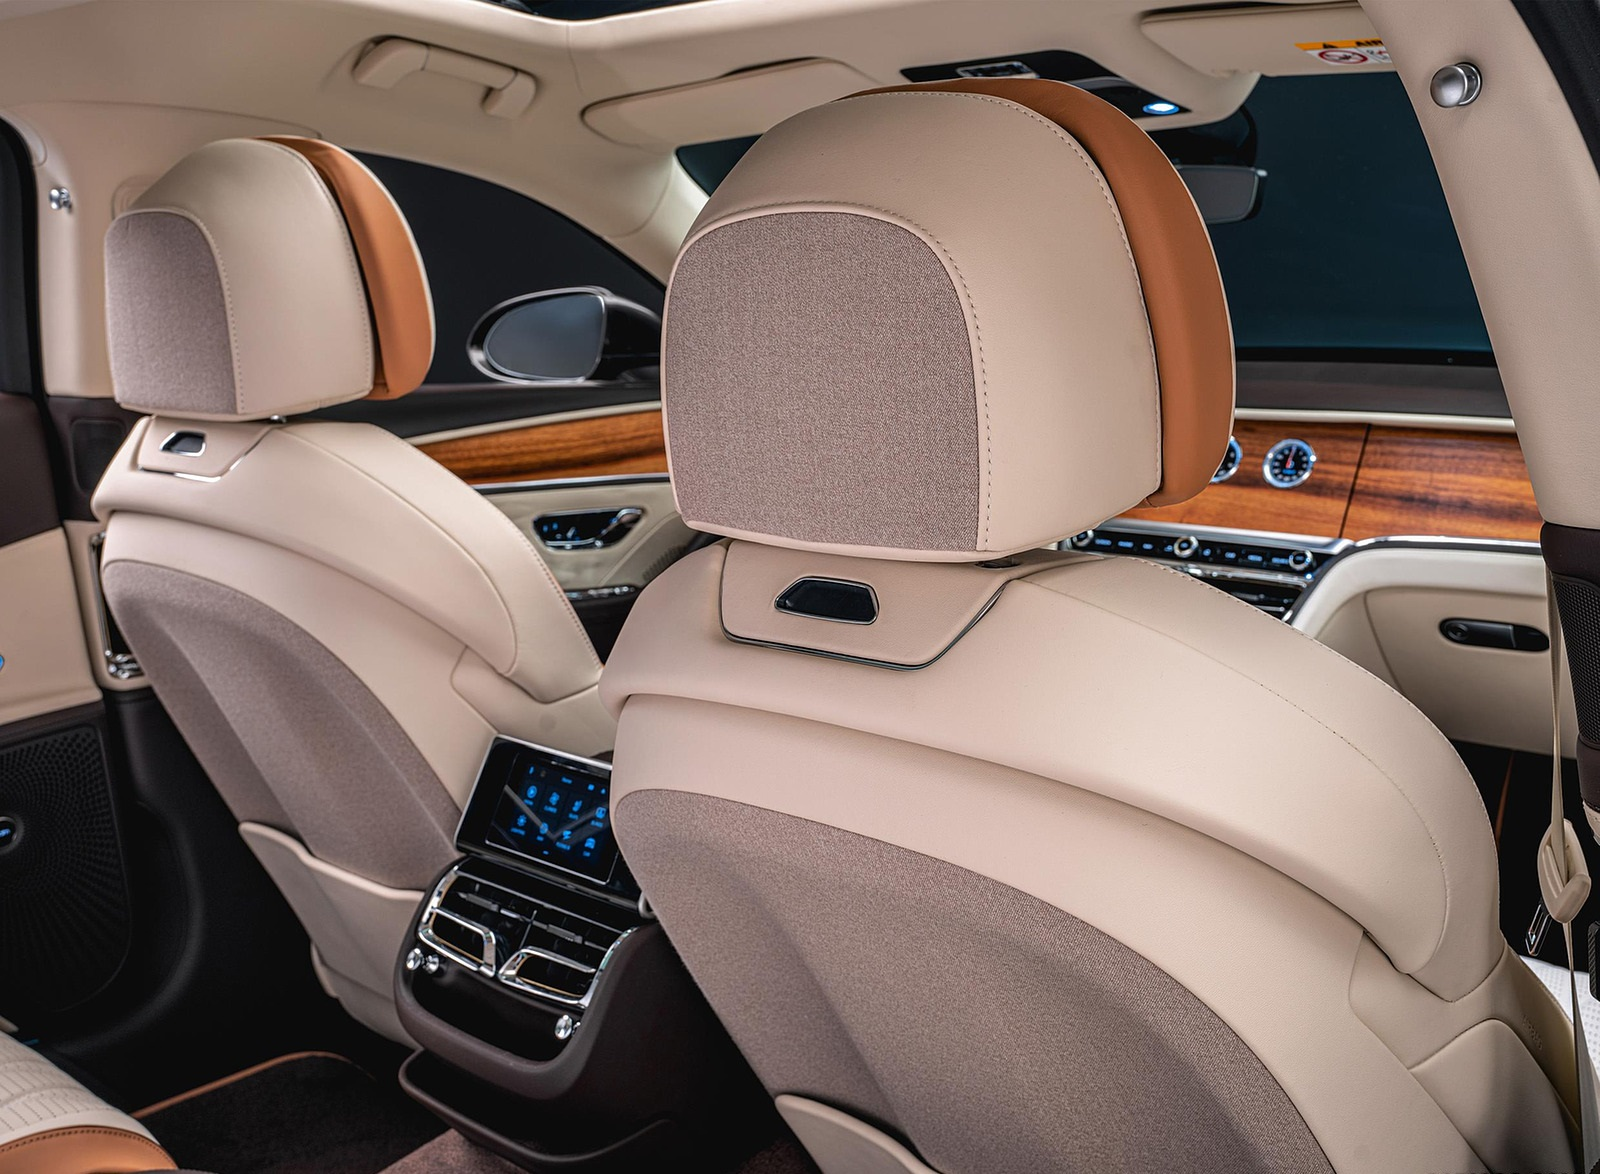 2022 Bentley Flying Spur Hybrid Odyssean Edition Interior Seats Wallpapers (10)